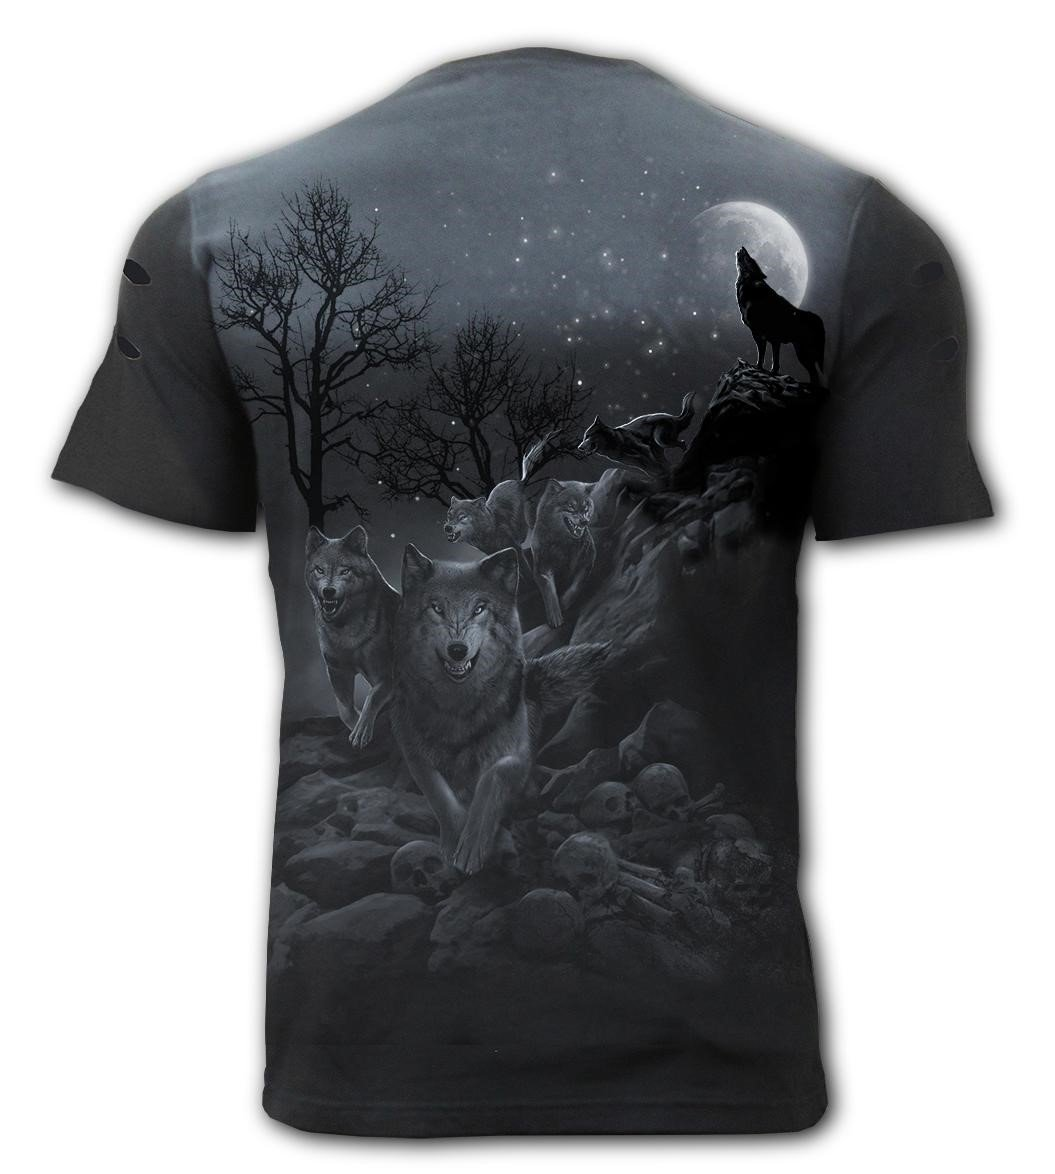 8abaf7c308ad2b Sklep veoevo.pl - Koszulki Malowane Pazurem - Shadow Wolf - Spiral ...